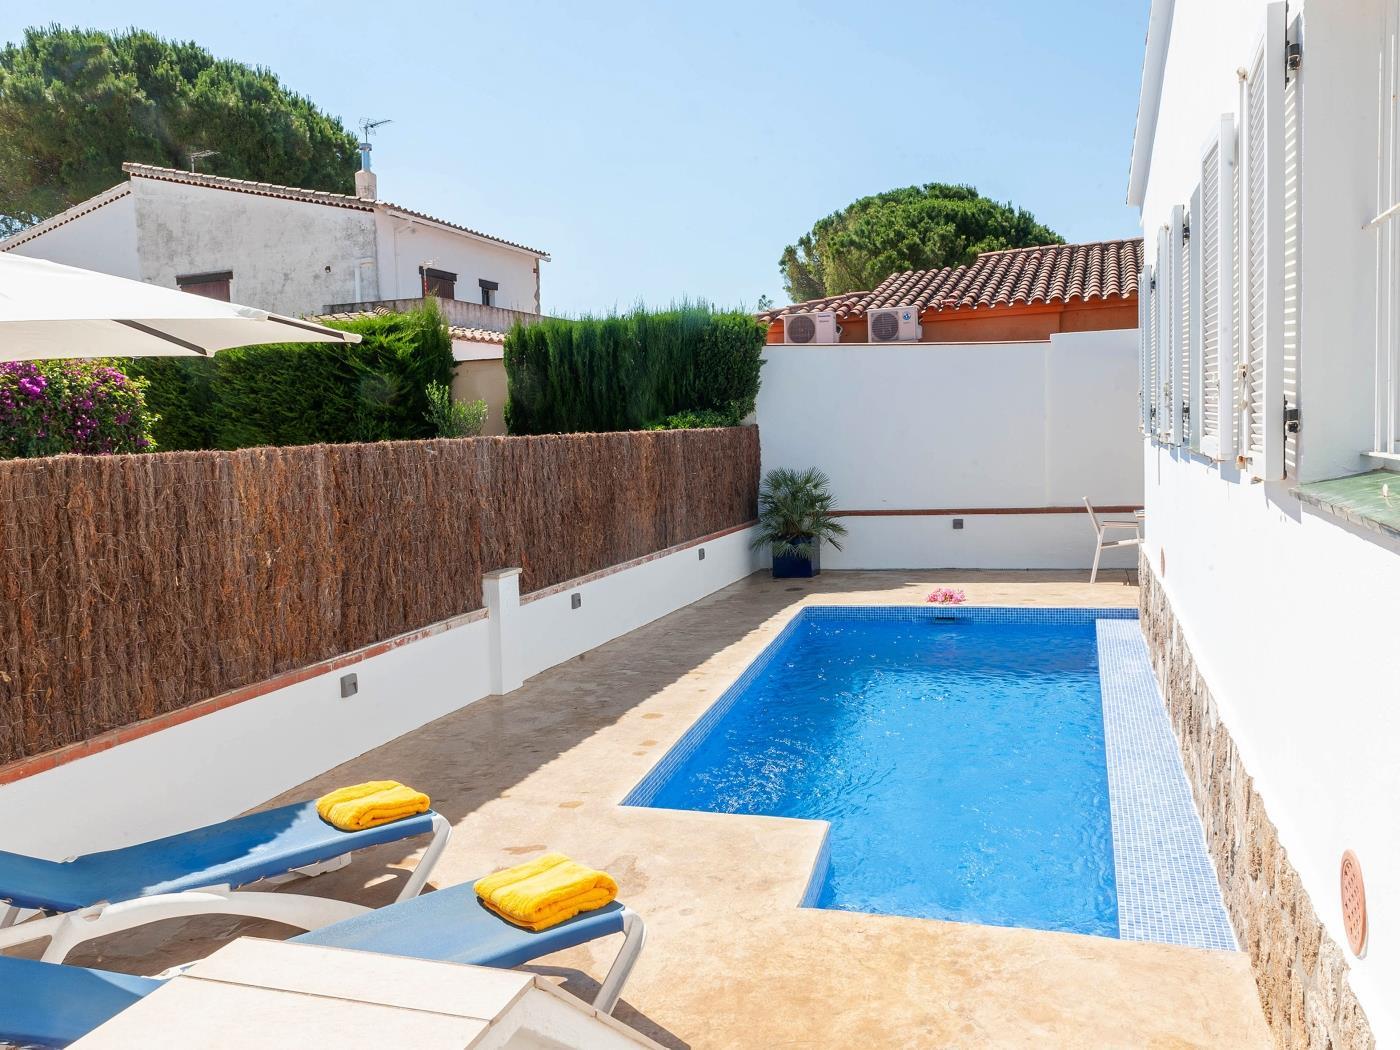 House With Private Pool Close To The Main Beach Hutg 052443 18 Unico Costa Brava